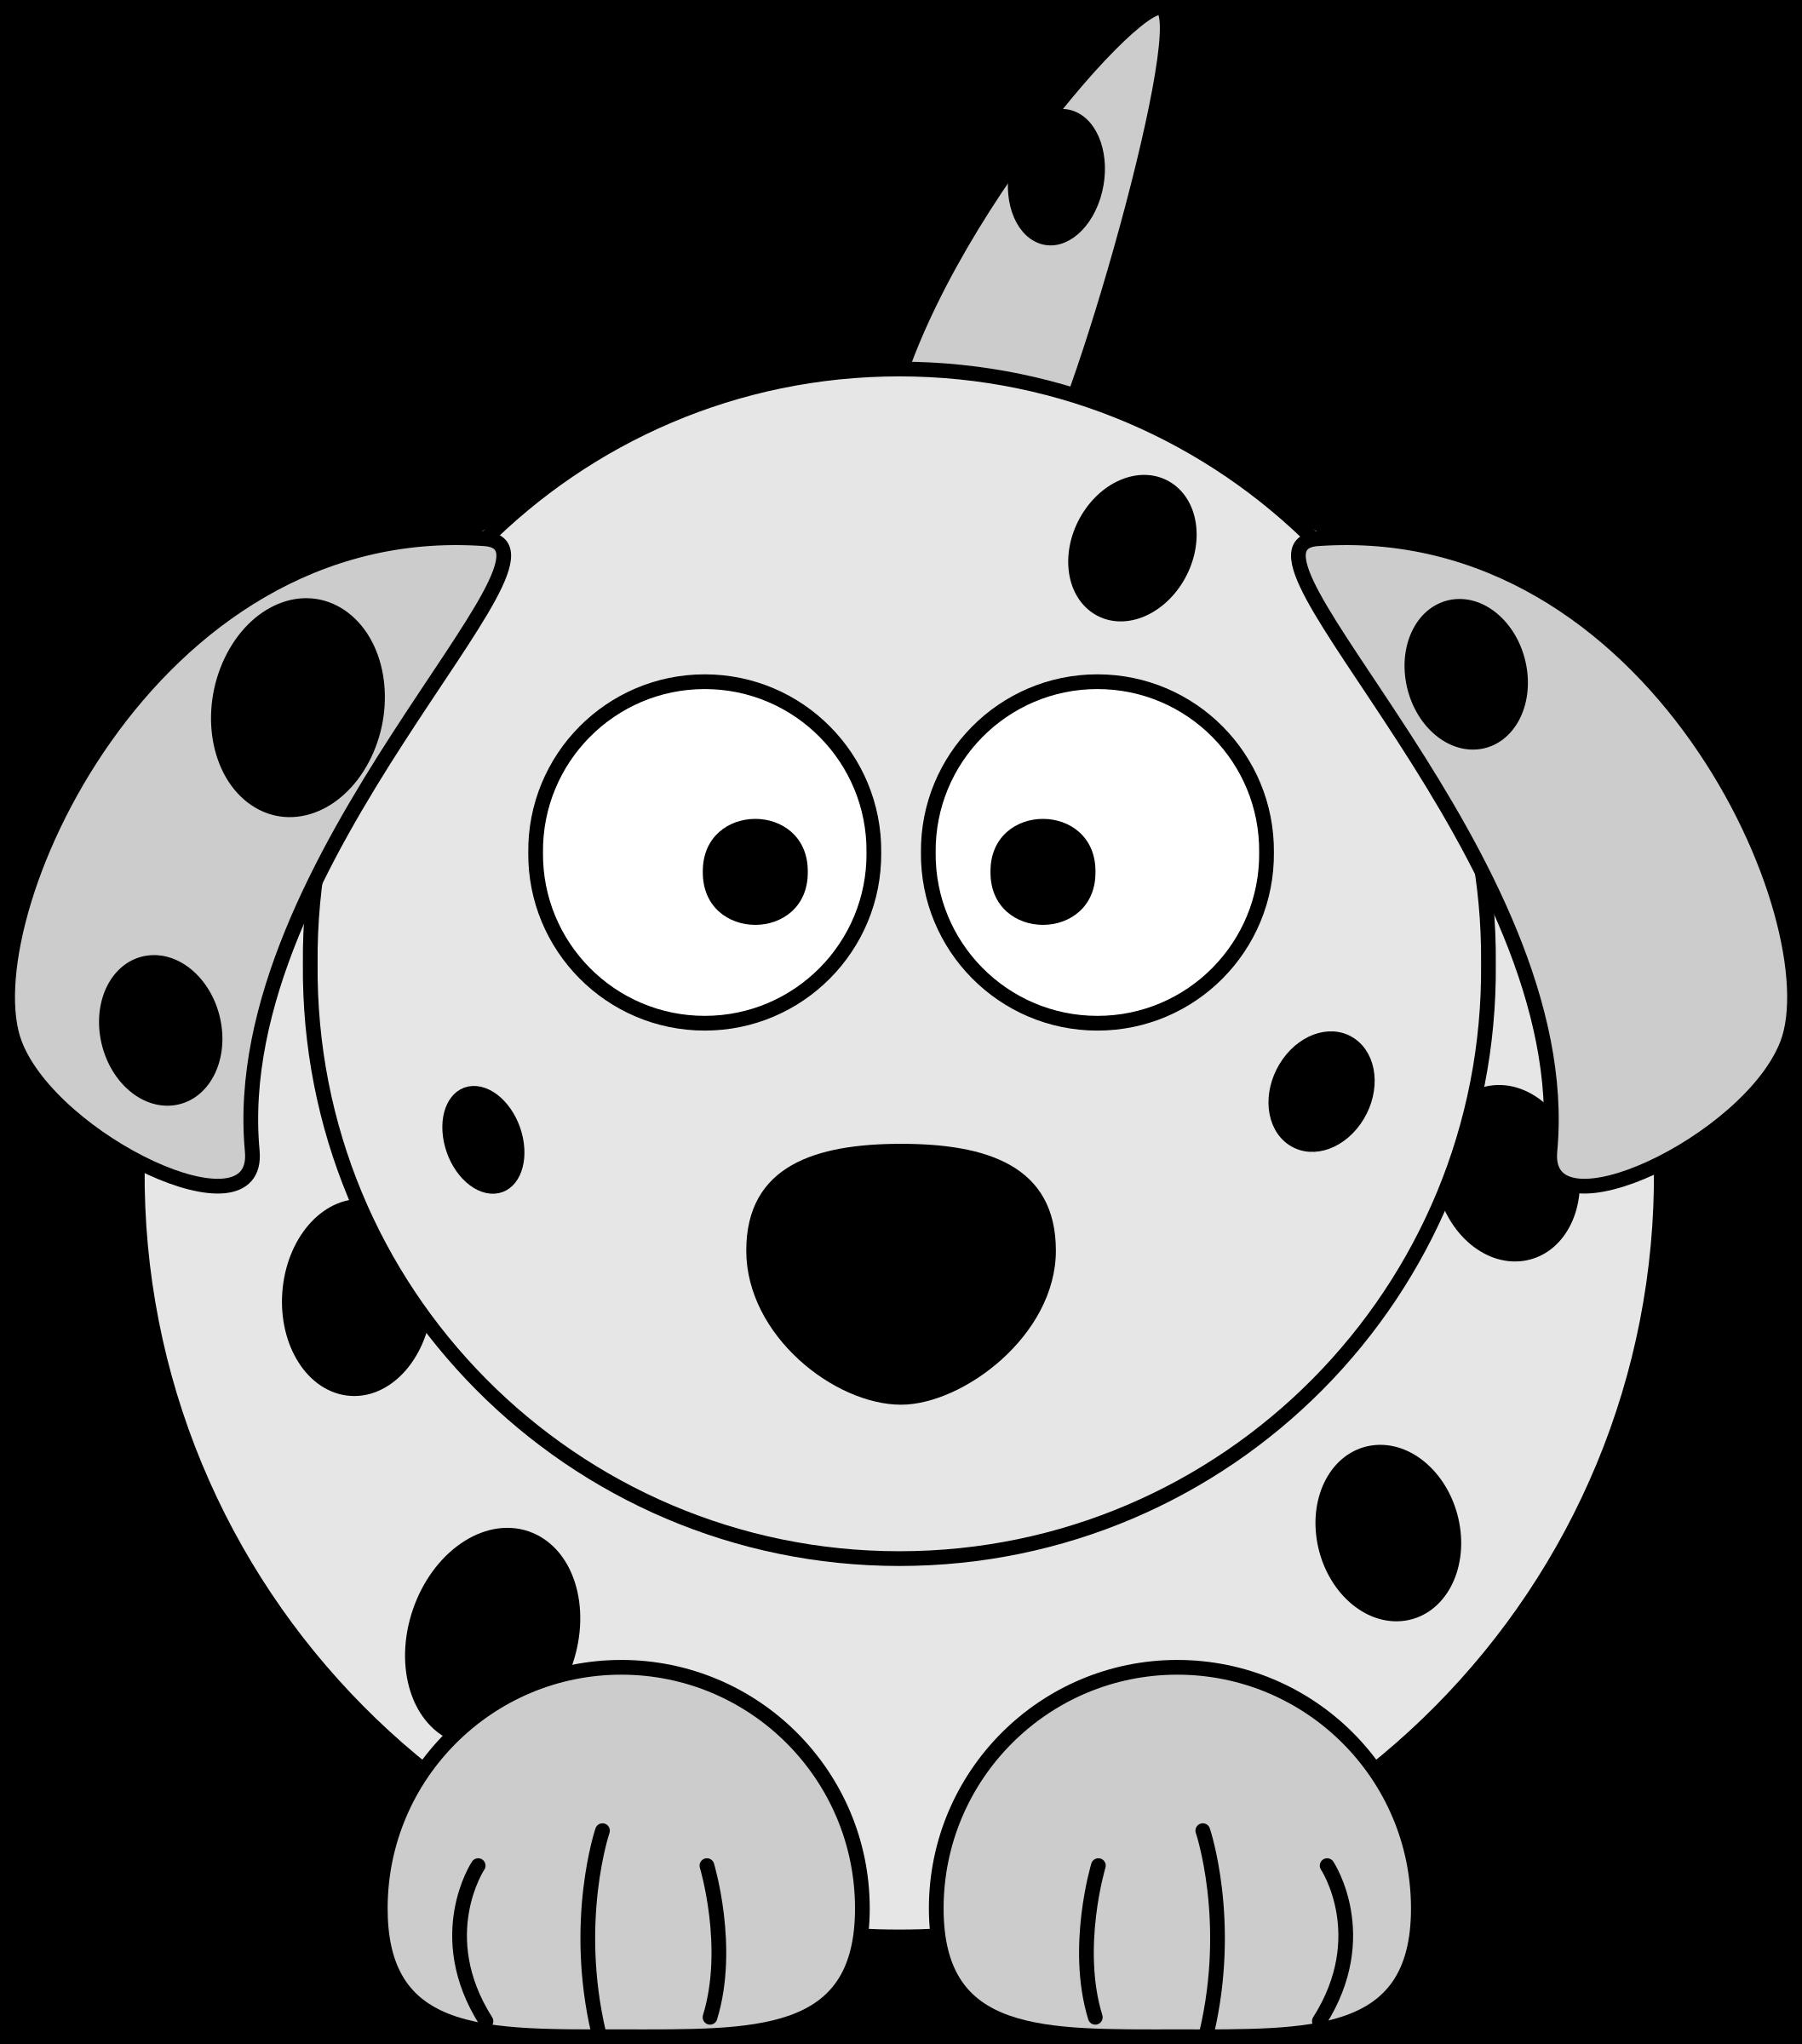 png black and white download Cartoon dog big image. Dalmatian clipart.